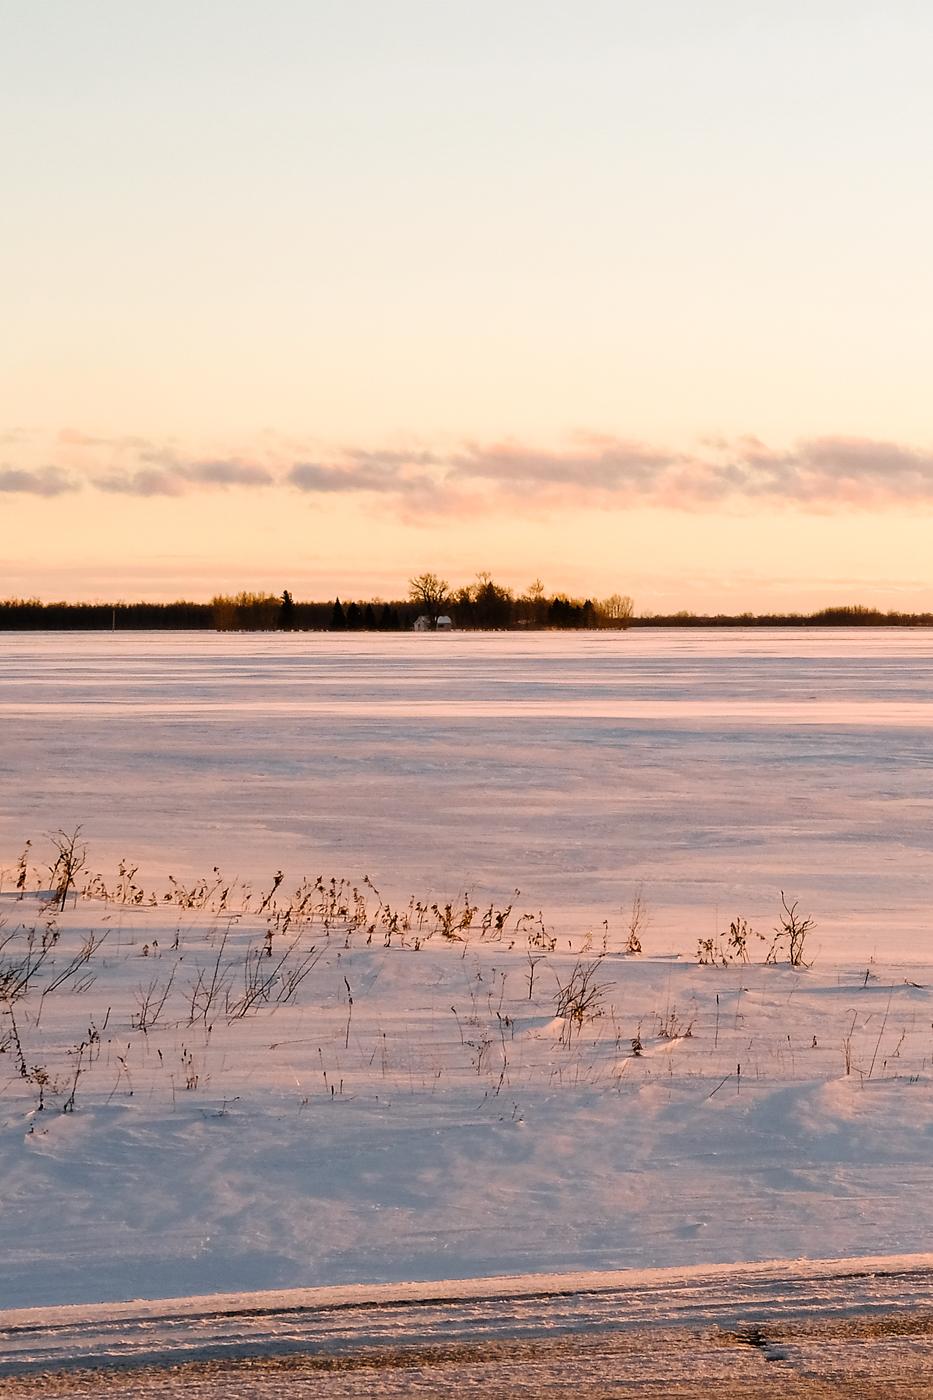 Debora Dahl winter sunset on the praire